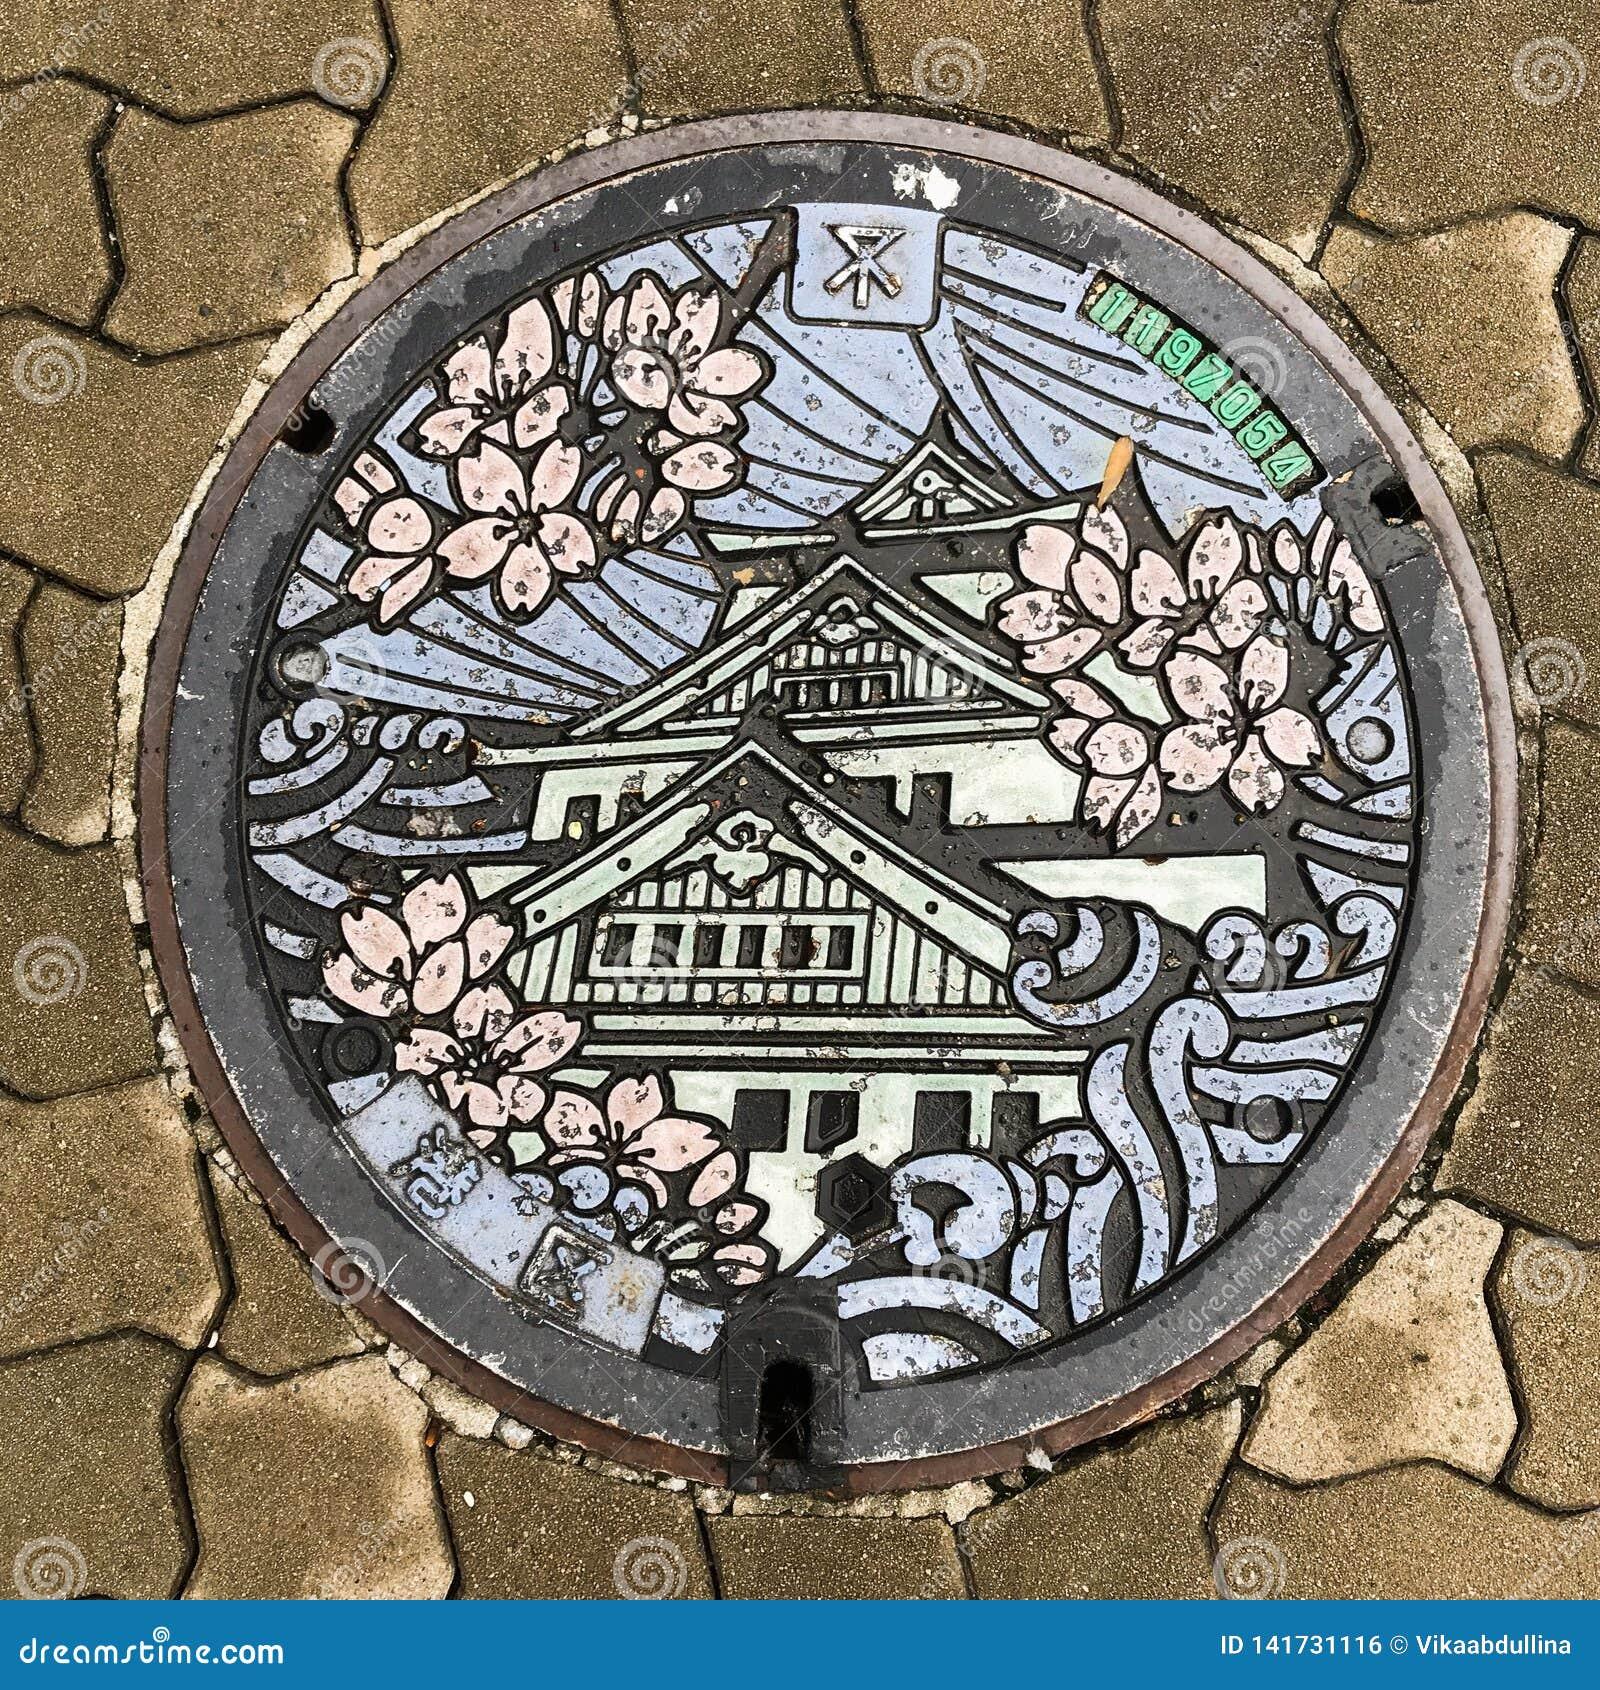 Osaka, Japón: casquillo de la alcantarilla/cubierta de boca/portilla, medios Osaka de la lengua japonesa